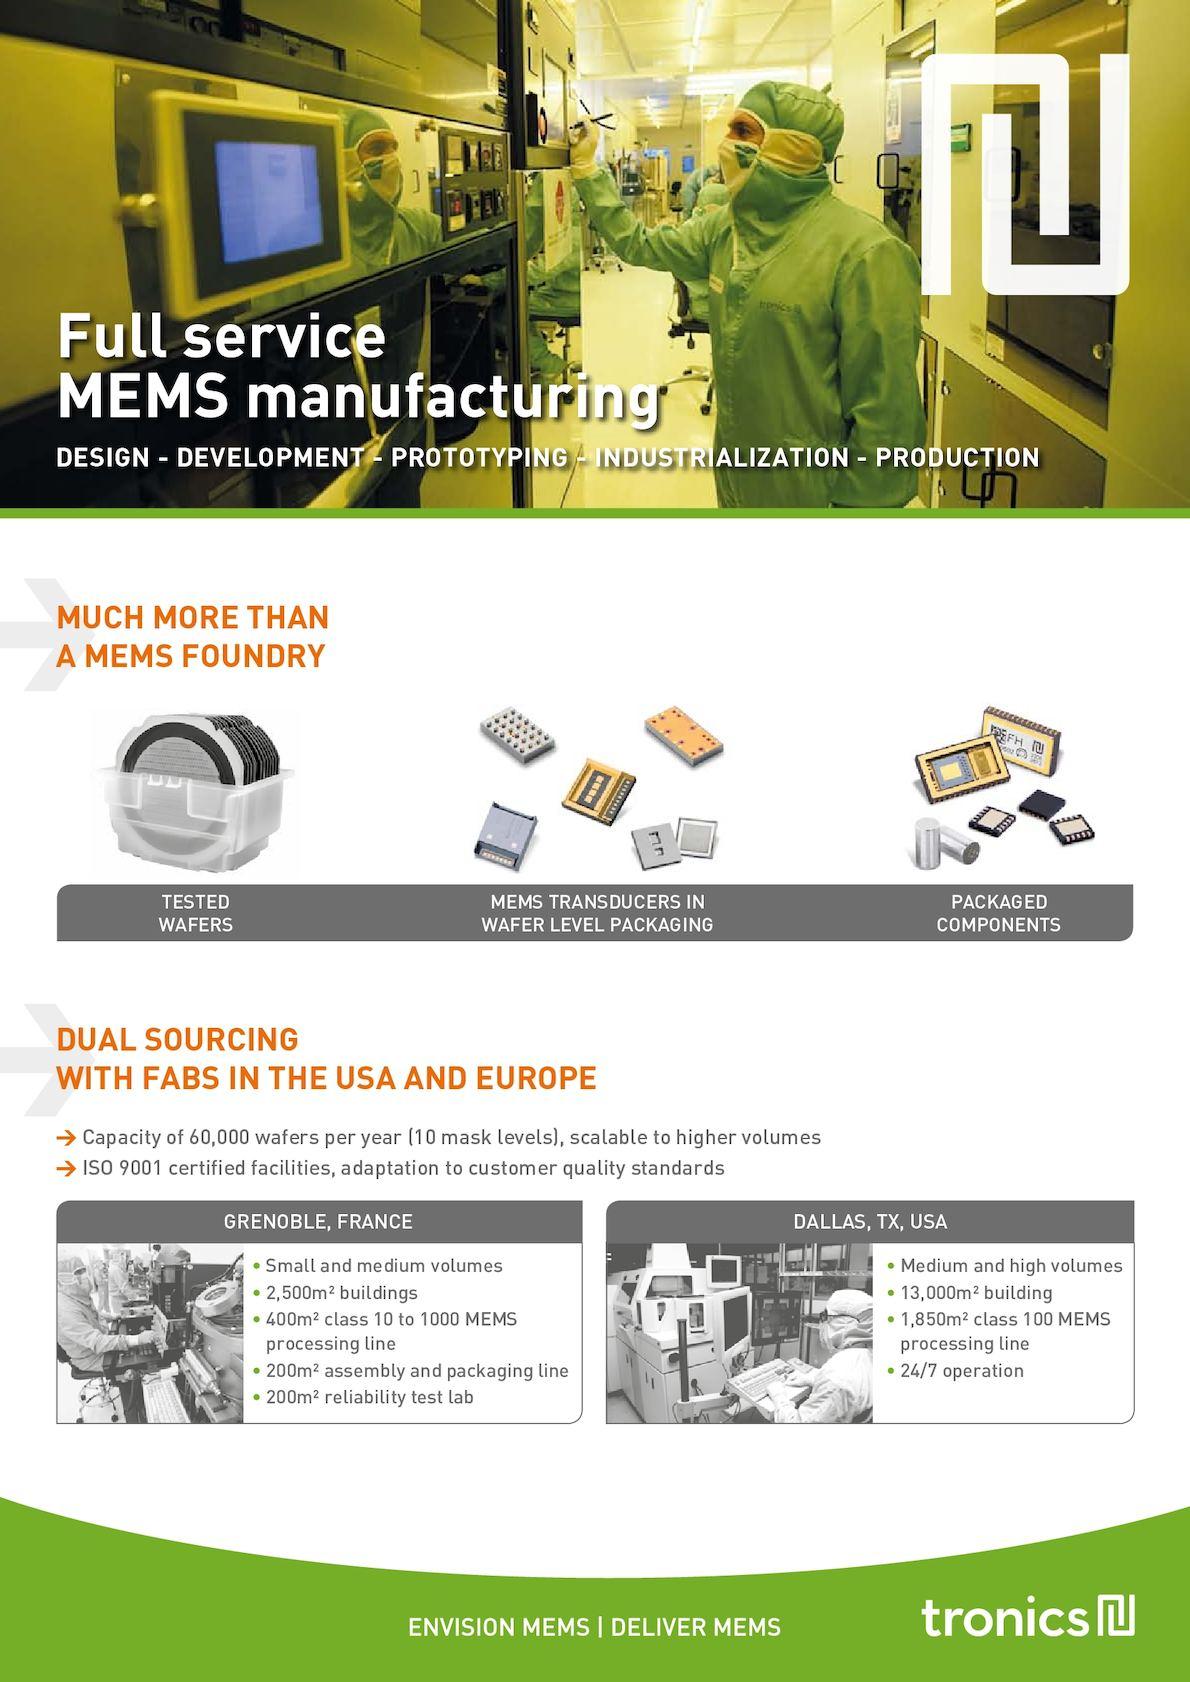 Tronics' Full Service MEMS Manufacturing